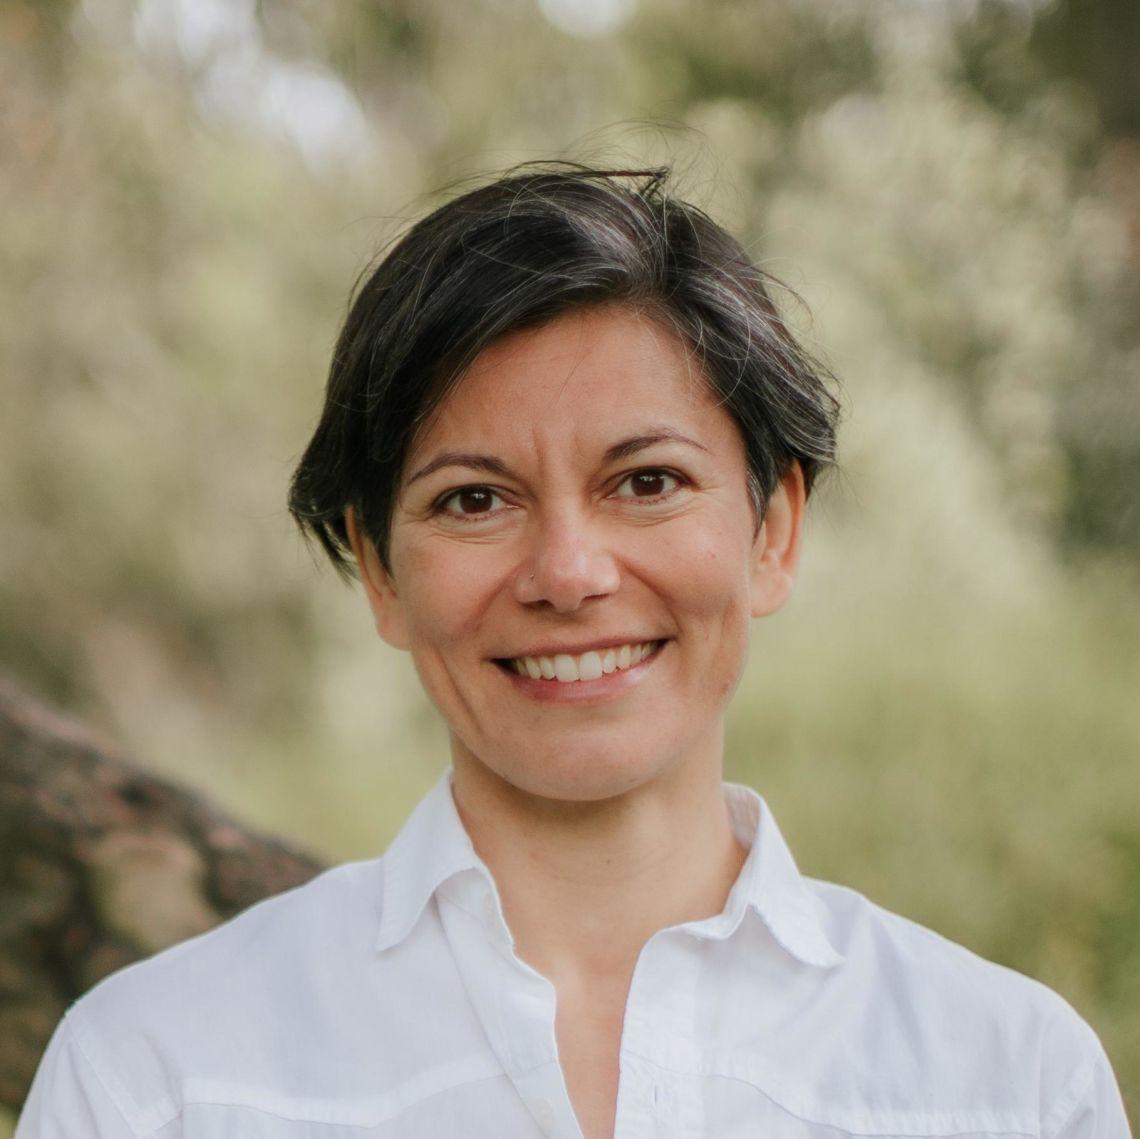 Associate Professor Angeliki Kerasidou